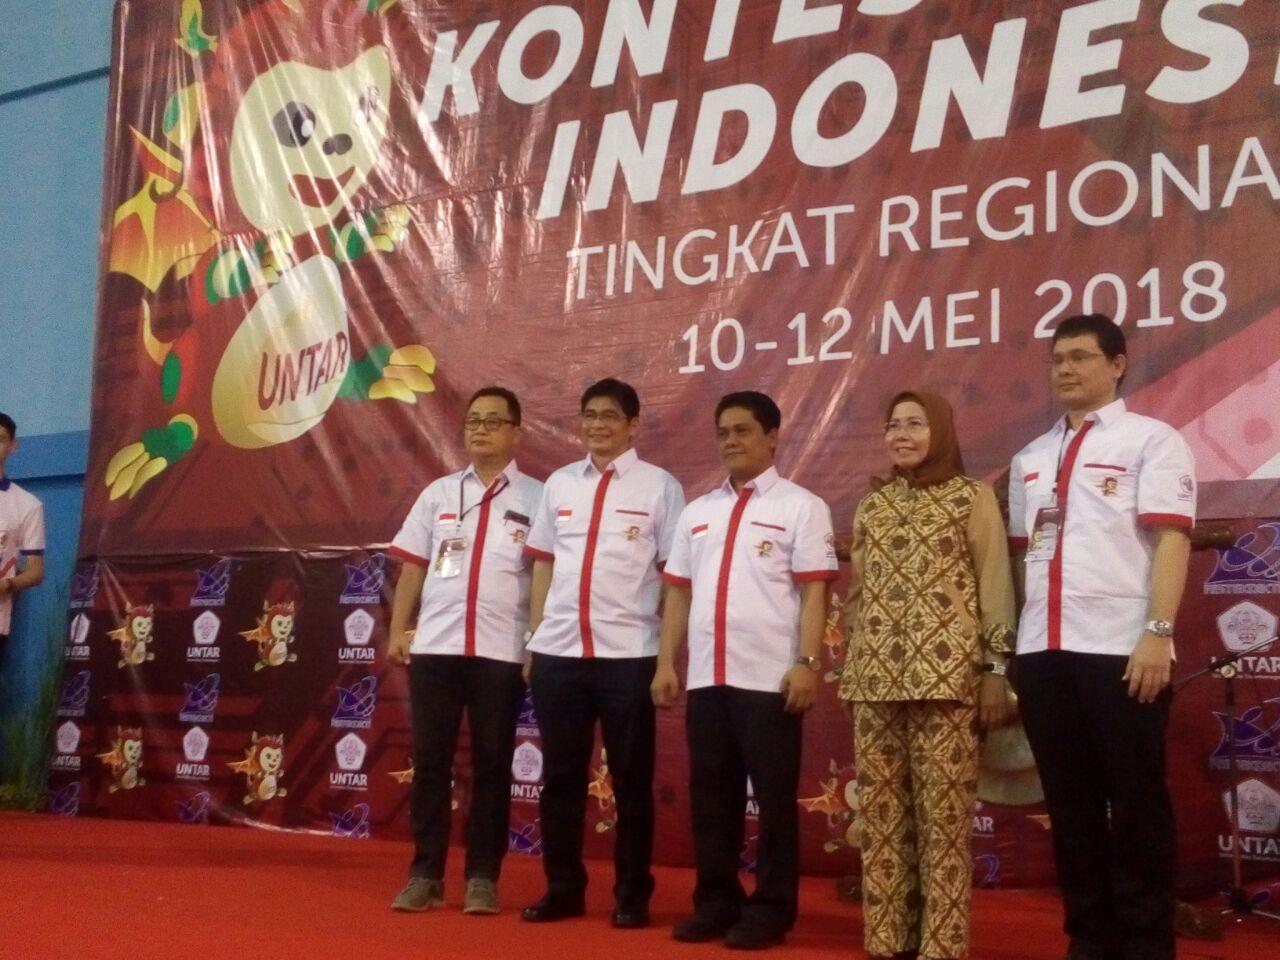 https: img-k.okeinfo.net content 2018 05 12 65 1897418 tuan-rumah-kontes-robot-indonesia-untar-dukung-pengembangan-sdm-menuju-industri-4-0-RMITLUqCZy.jpeg